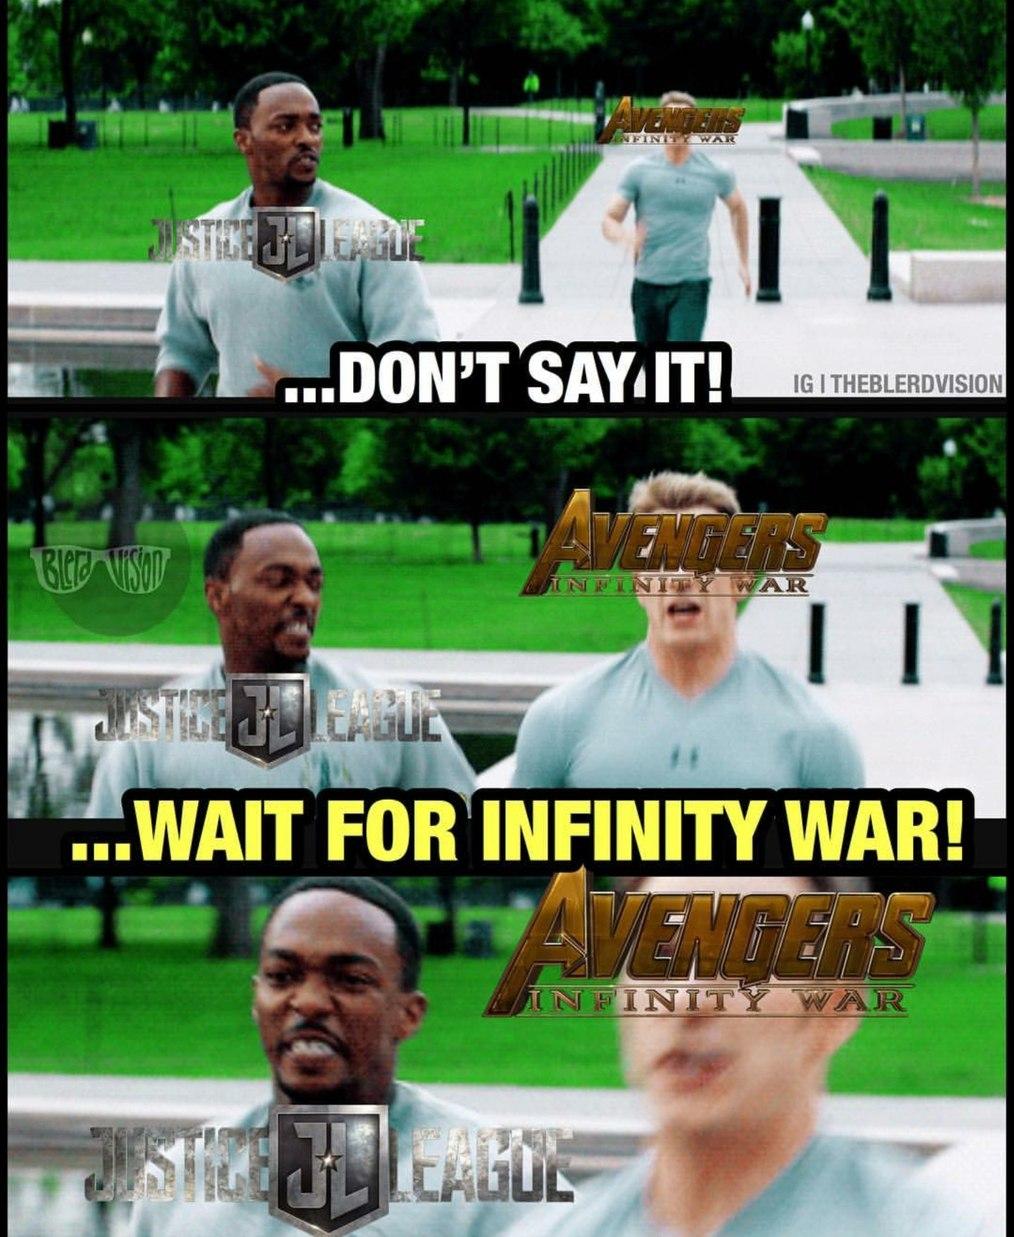 Infinity war>JL - meme